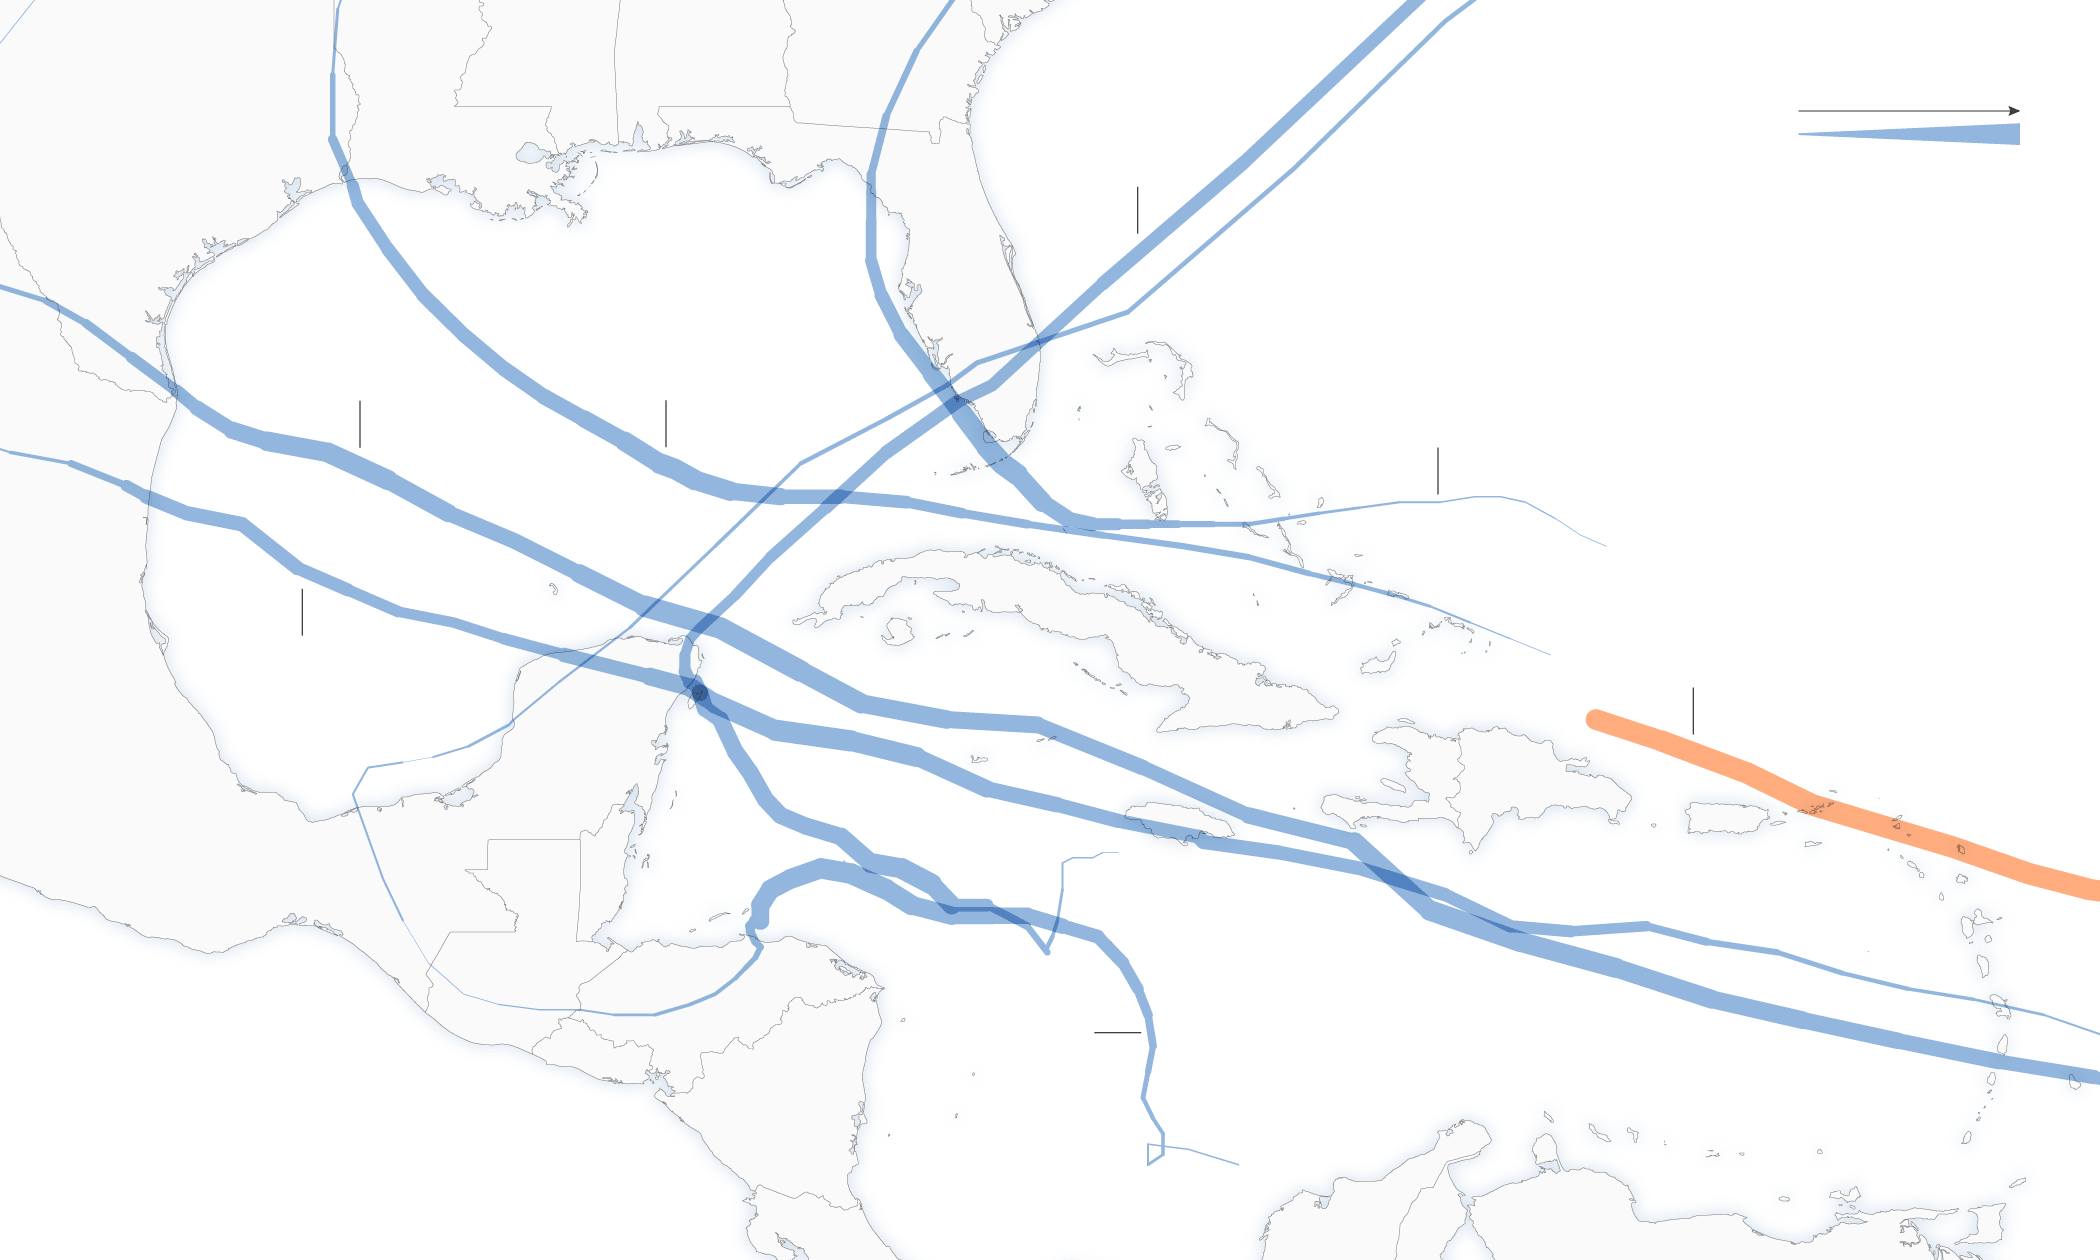 Maps Tracking Hurricane Irma S Path Over Florida Hurricane Map Storm